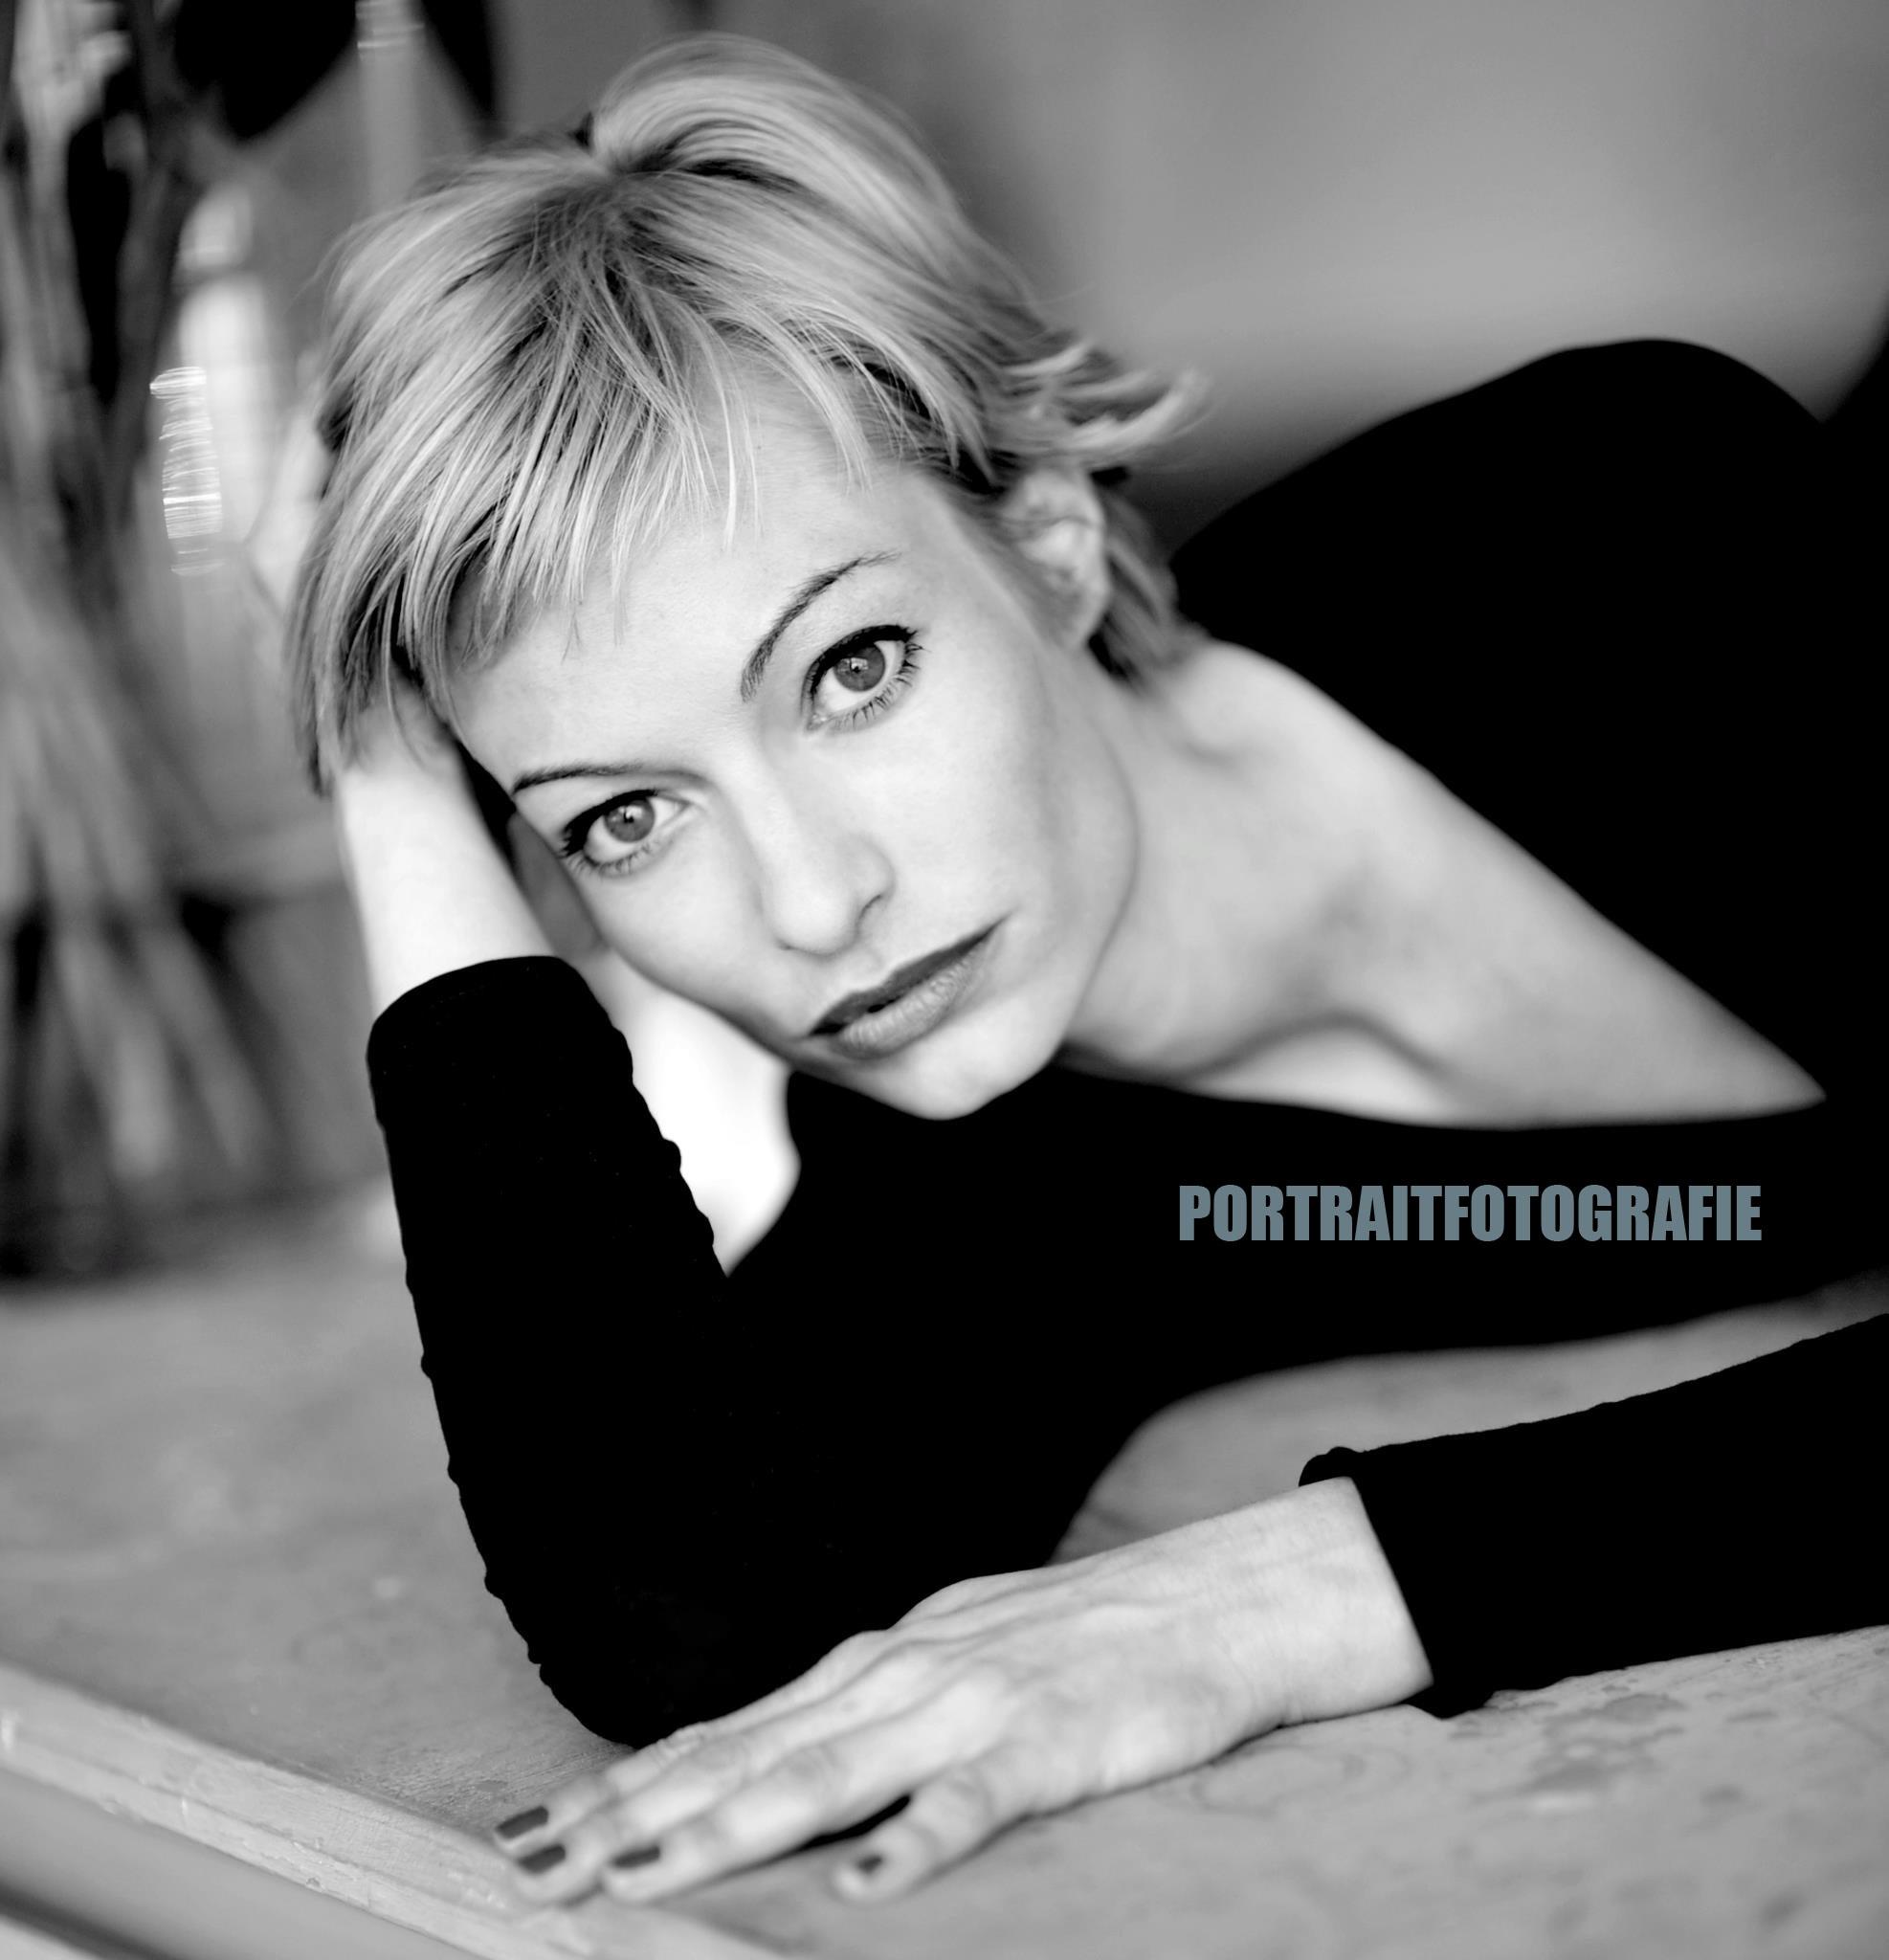 nicole-bouillon-fotografie-portraitfotografie-koblenz